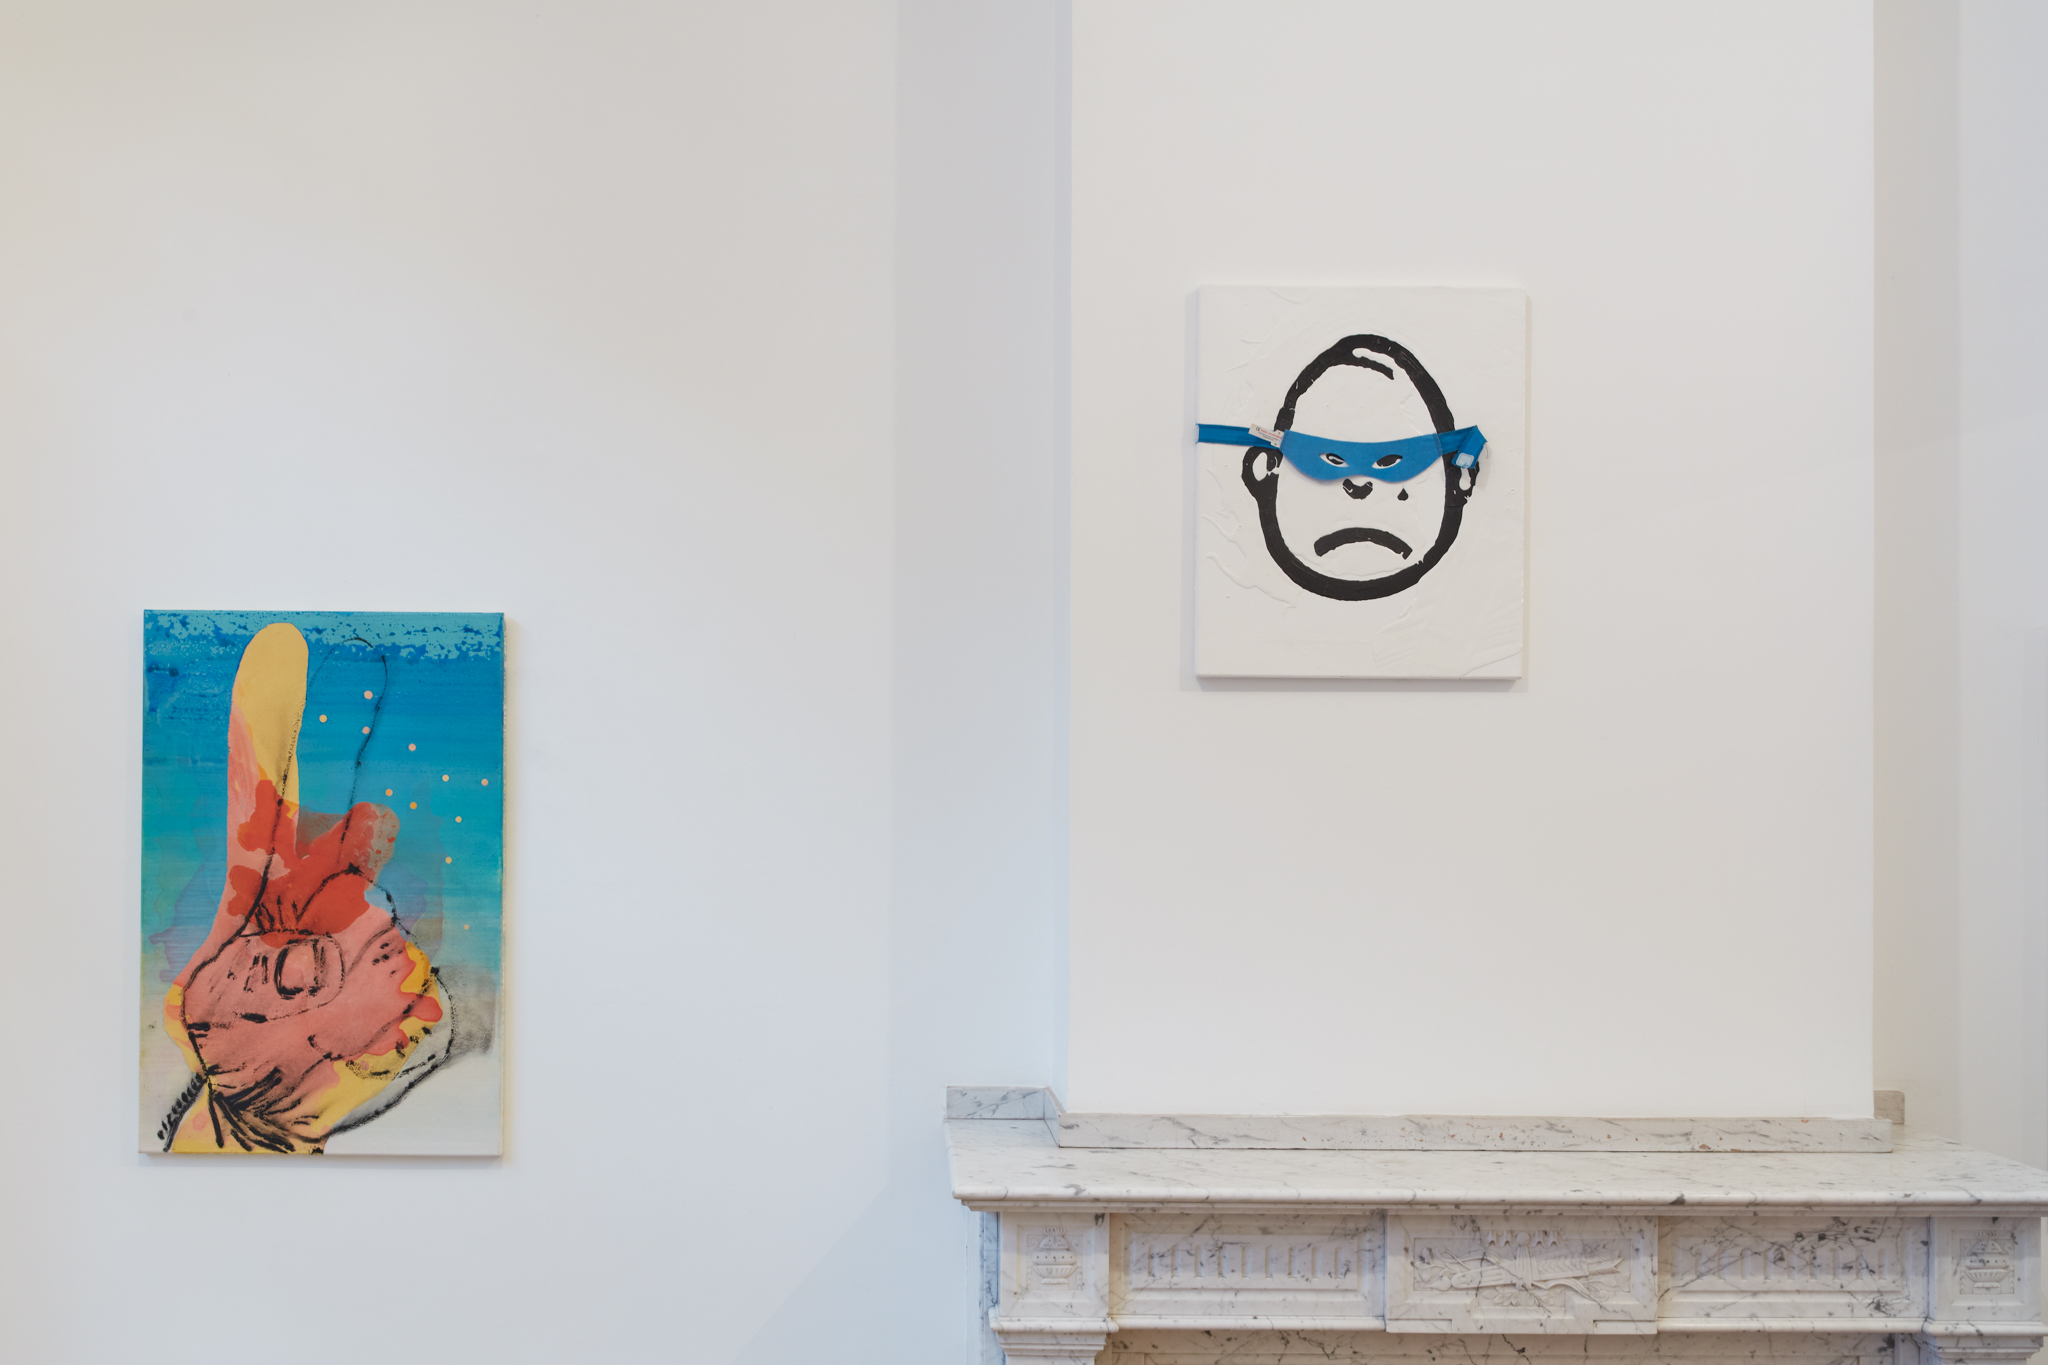 Rik Moens, Untitled, 2018